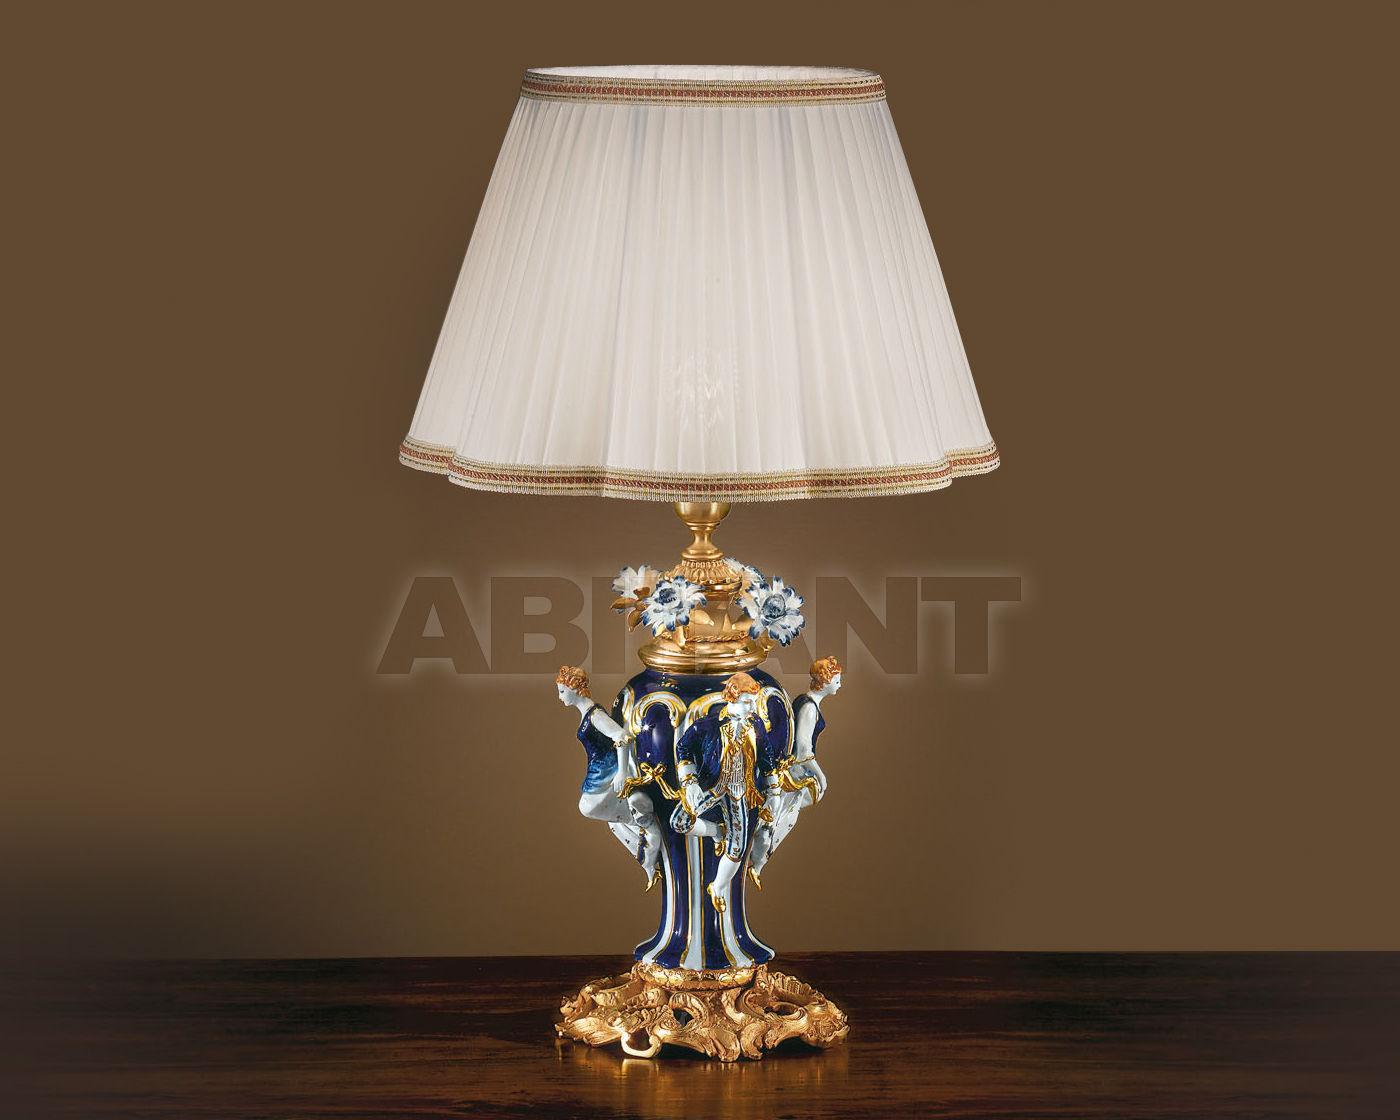 Купить Лампа настольная F.B.A.I. Candeliere P3188